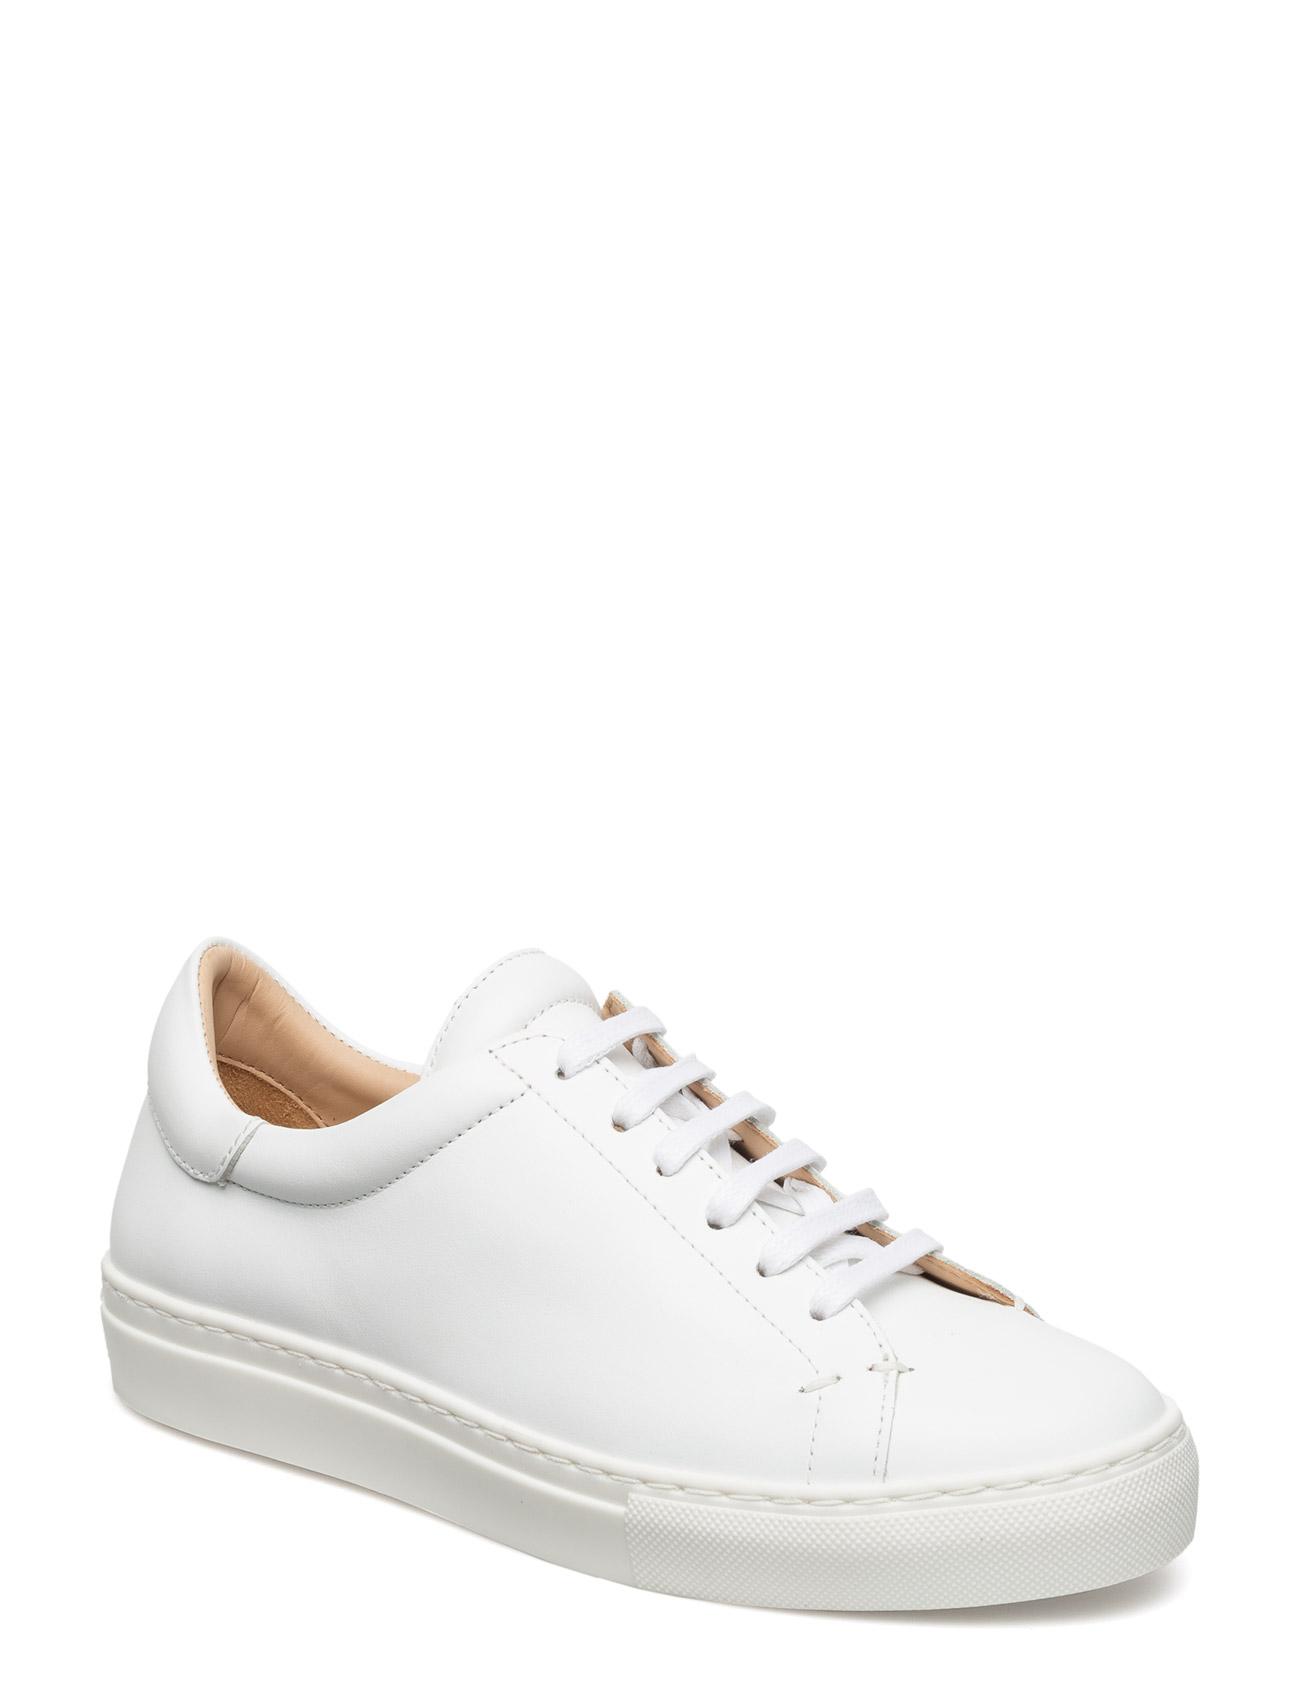 Culorbe By Malene Birger Sneakers til Damer i Pure White